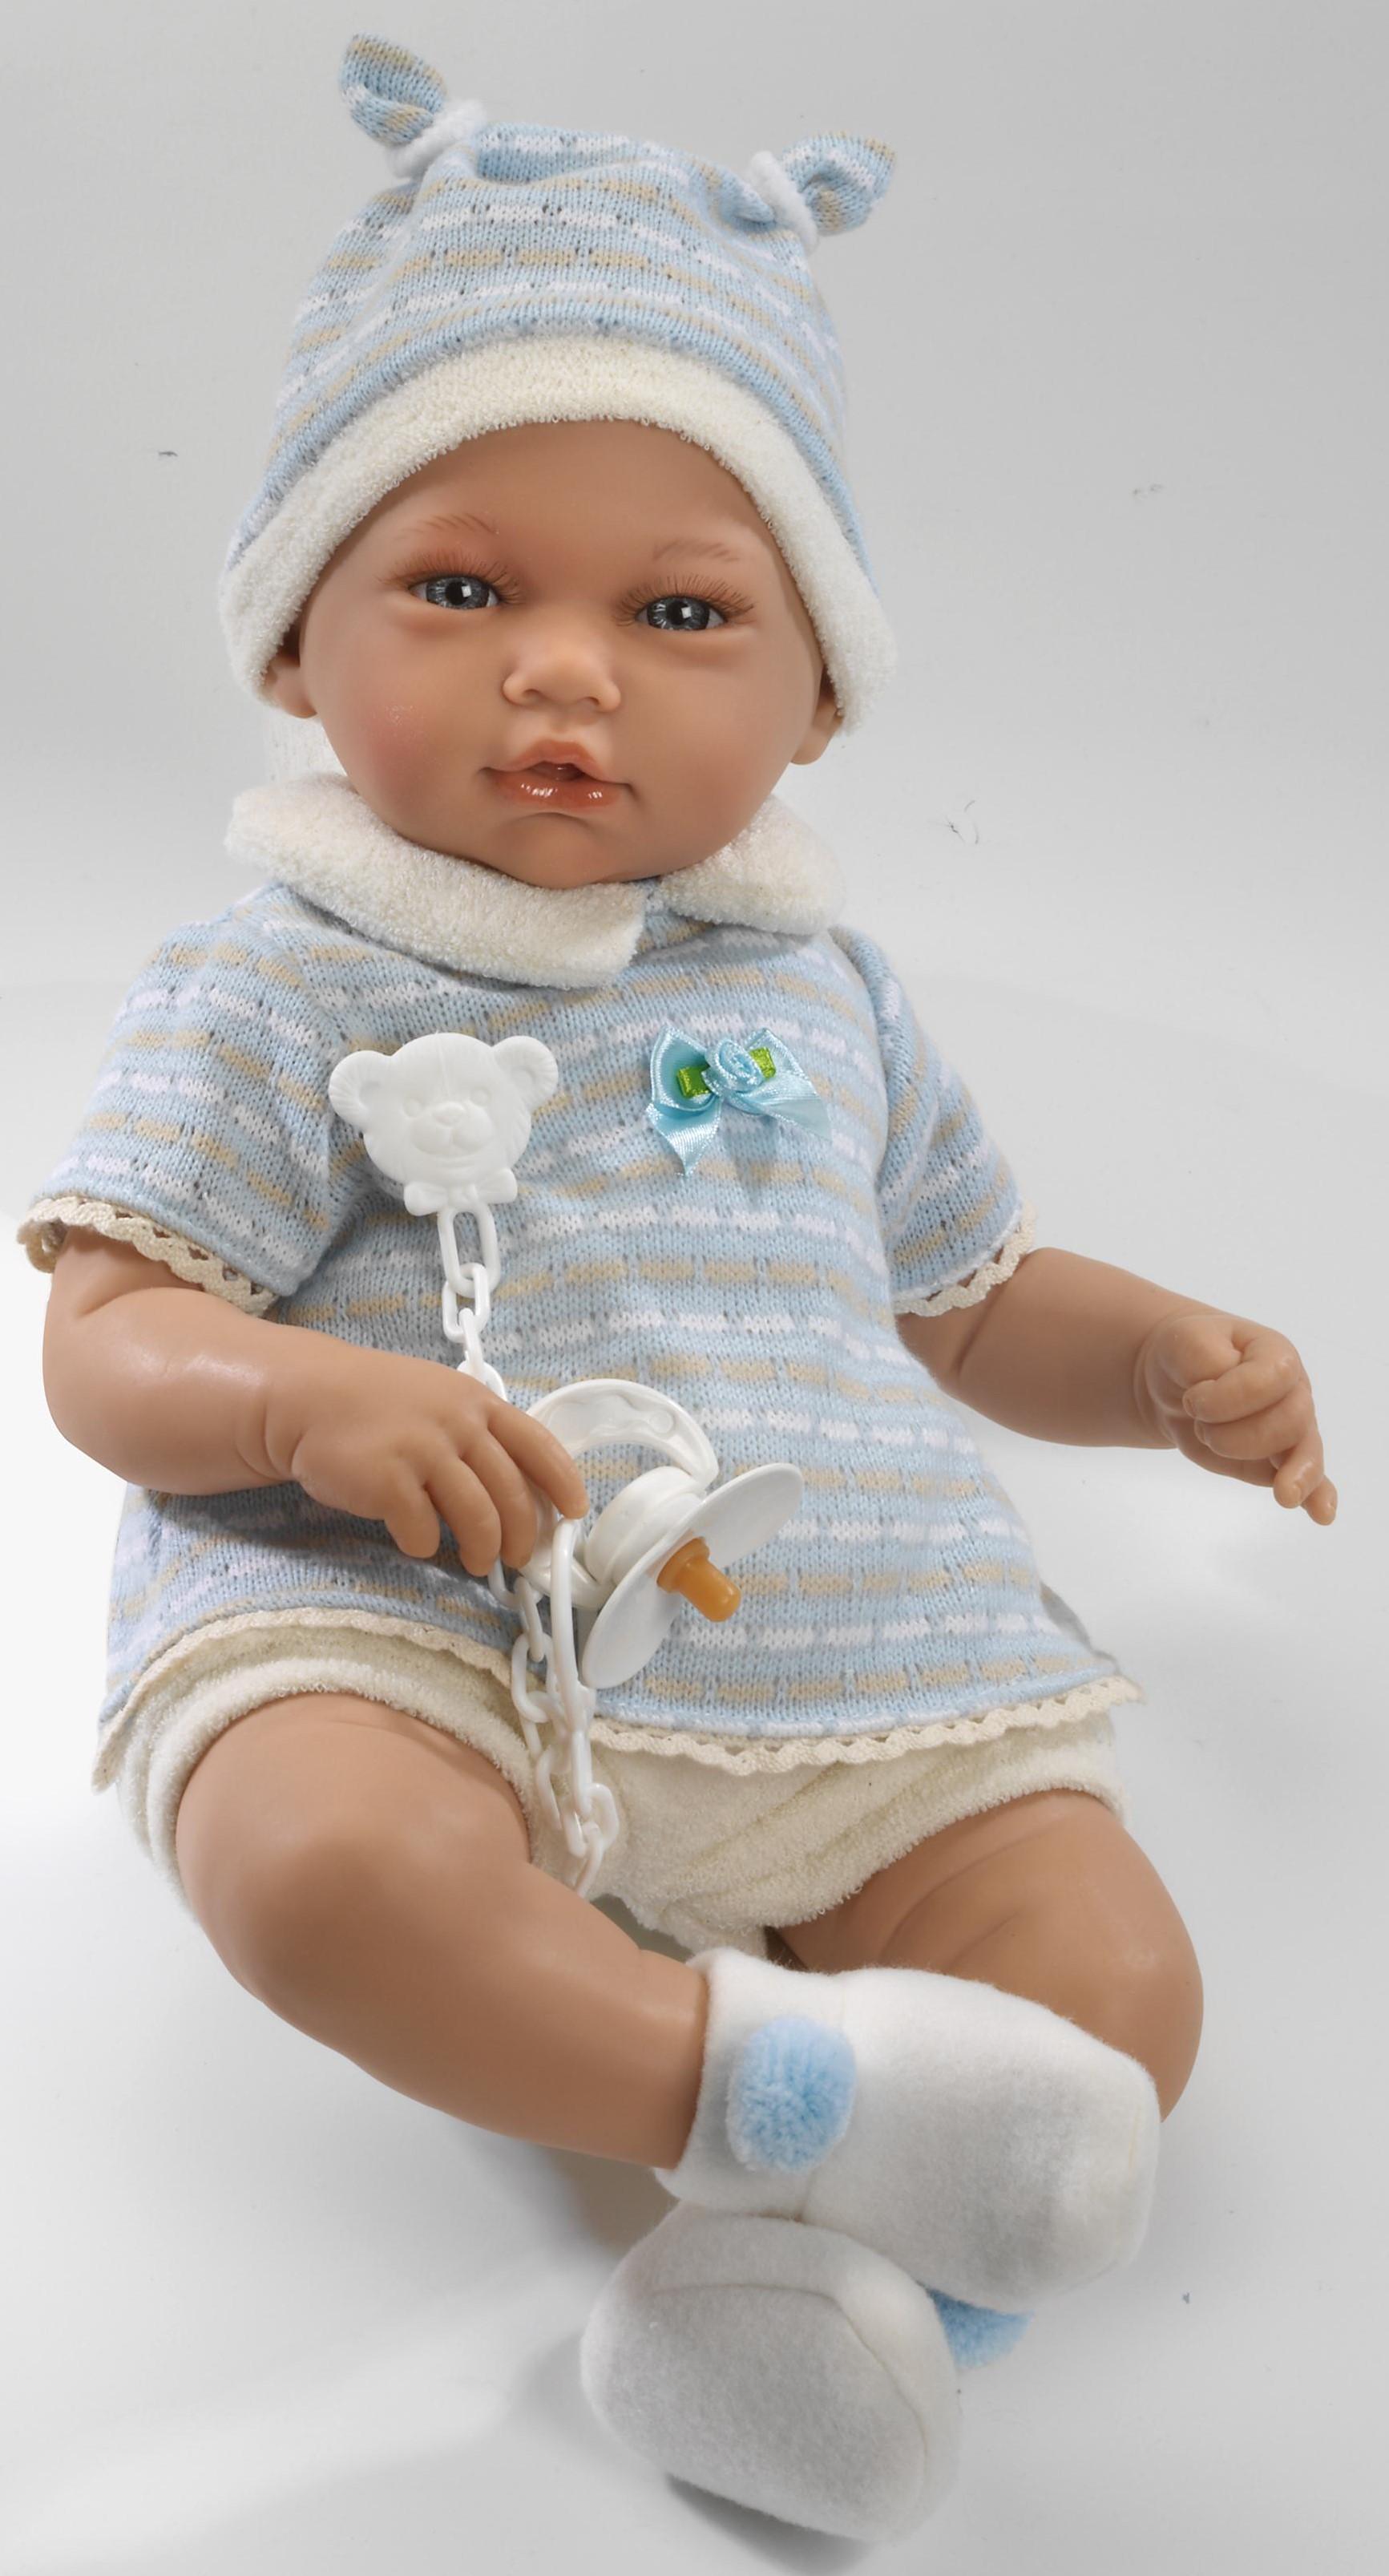 Realistické miminko - chlapeček Adrián od firmy Guca ze Španělska (Doprava zdarma)